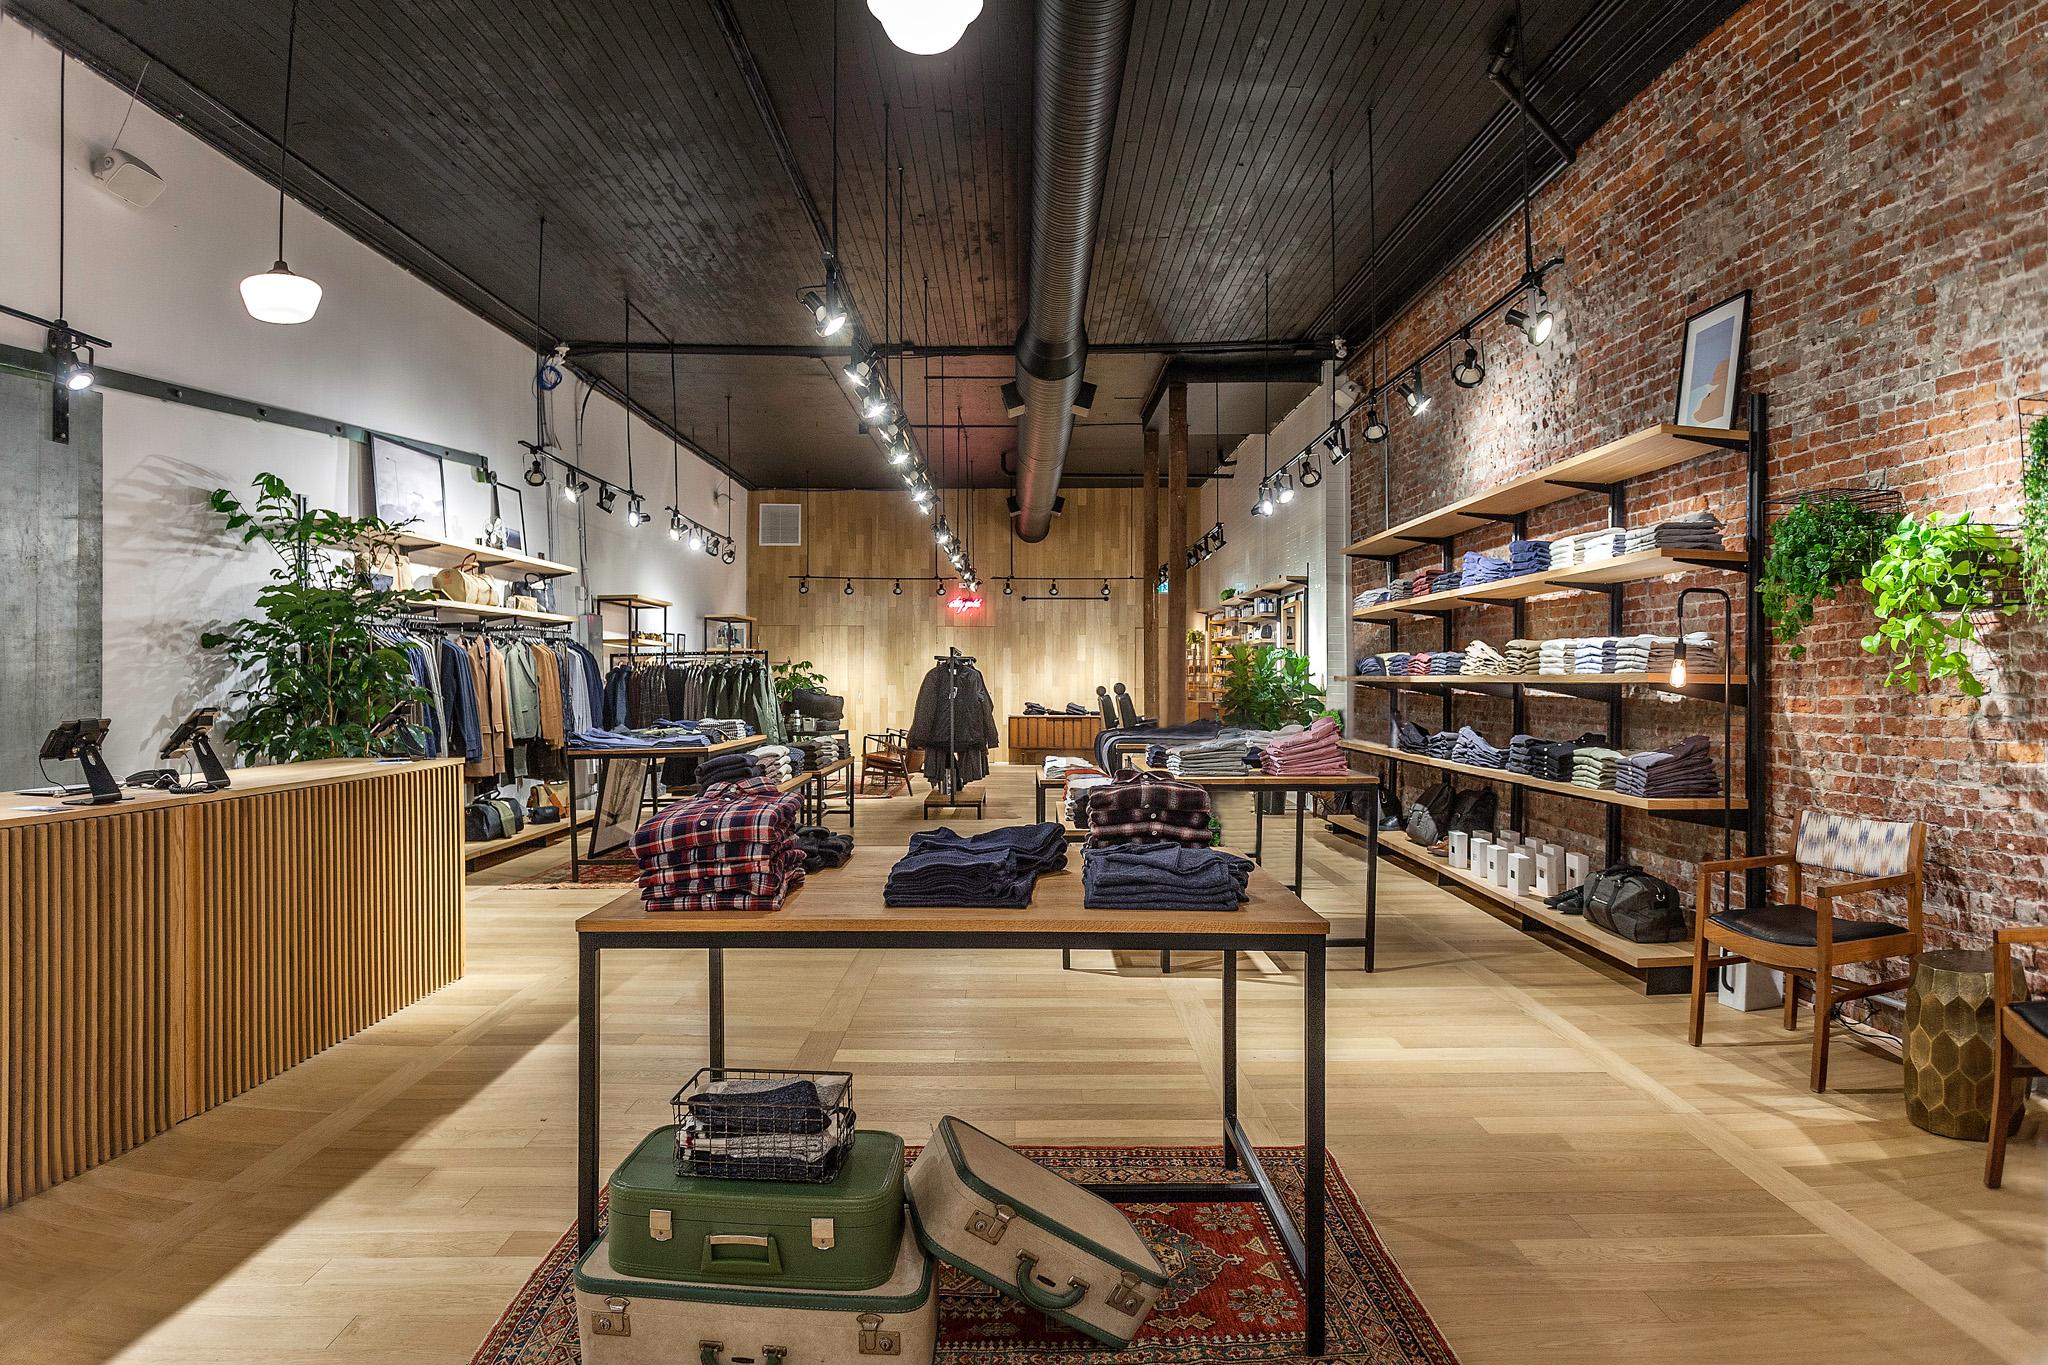 Frank & Oak, krokodile pear, Gastown, Helen Siwak, Man Cave Barber Shop, Vancouver, BC, Retail